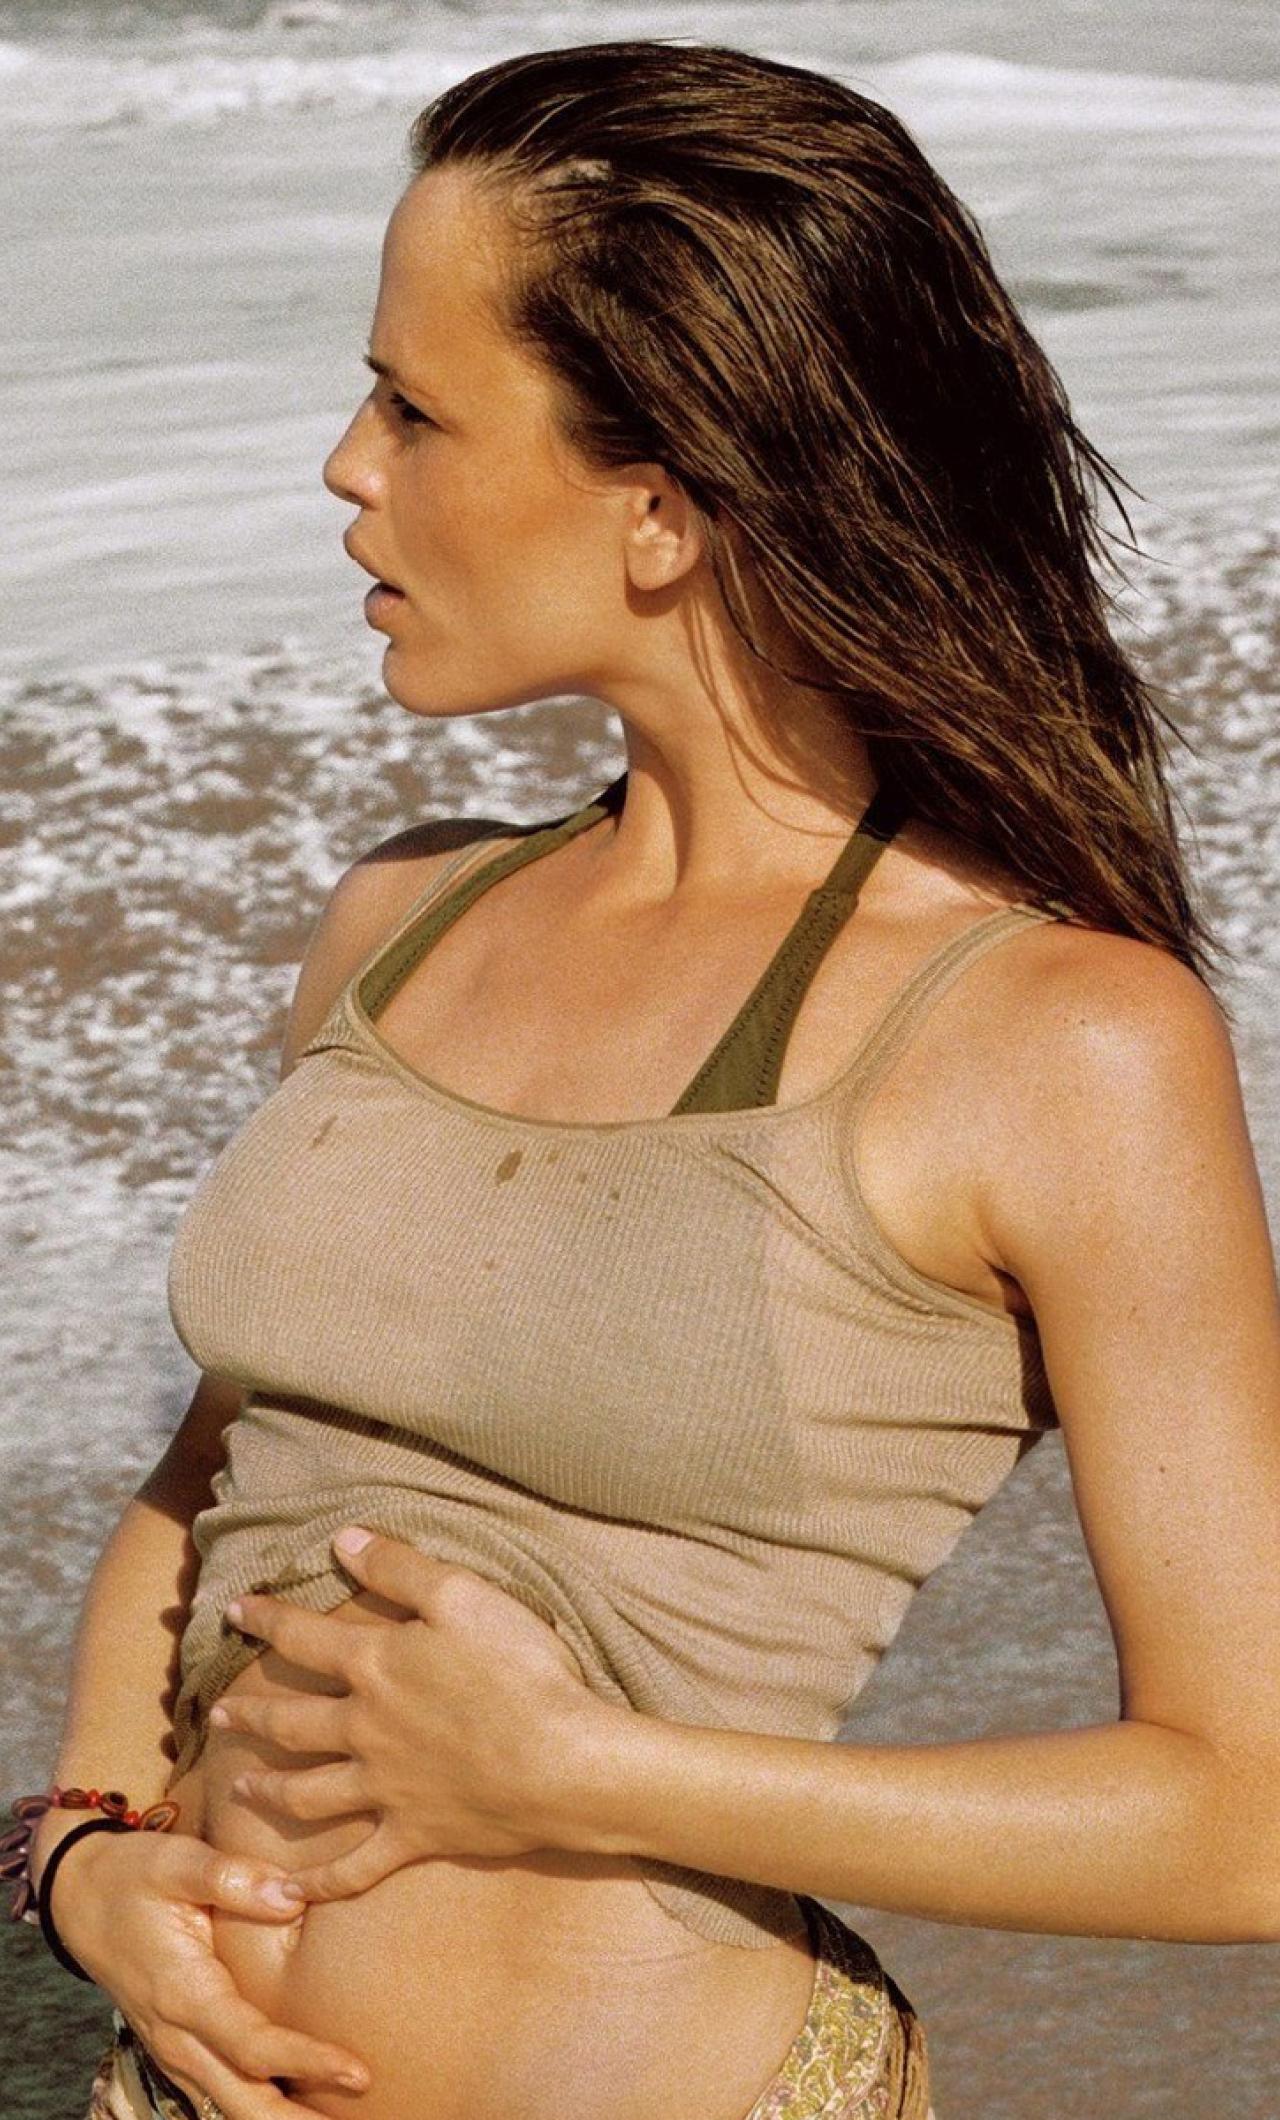 Jennifer Garner Hot Beach Photoshoot, Full Hd Wallpaper-5889